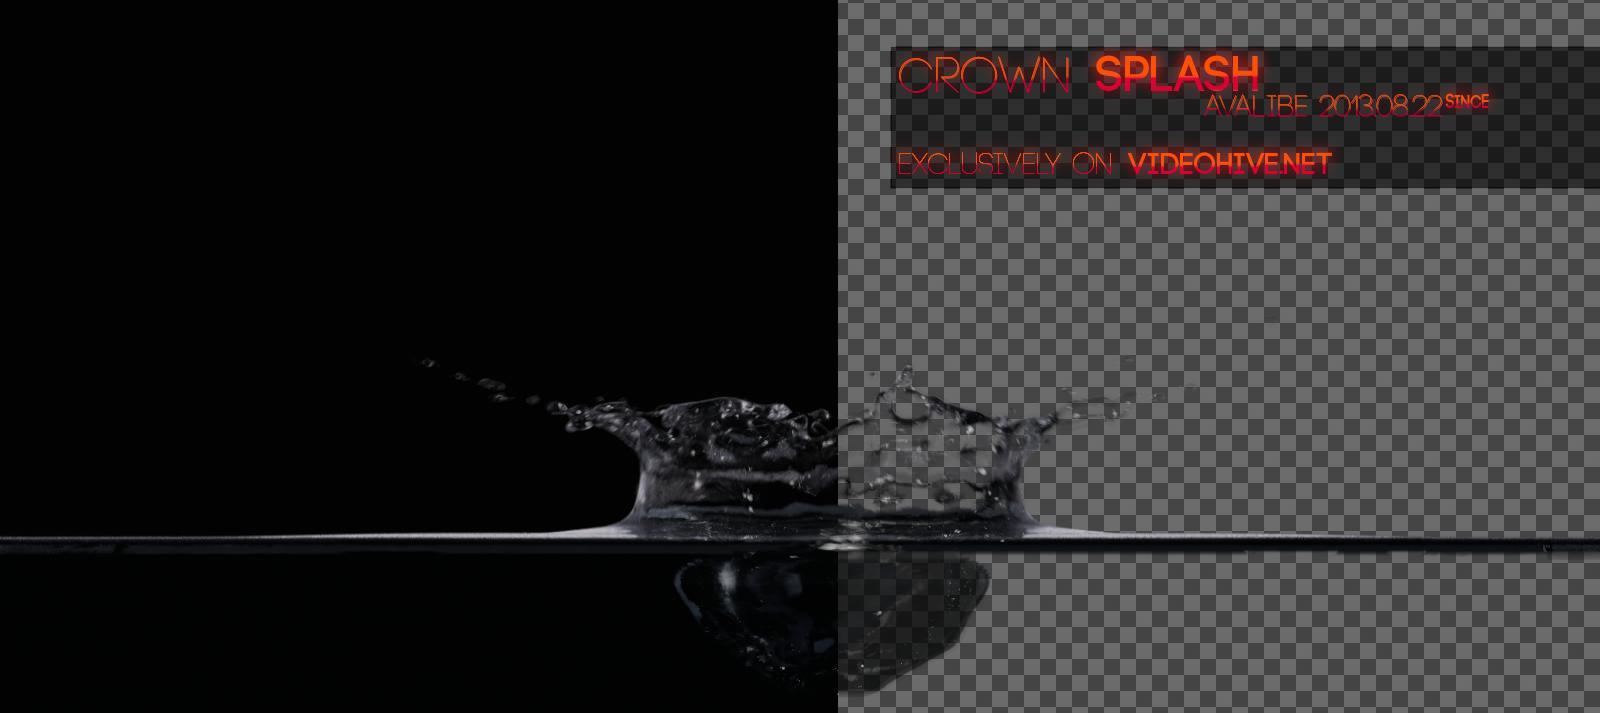 Classic Crown Splash